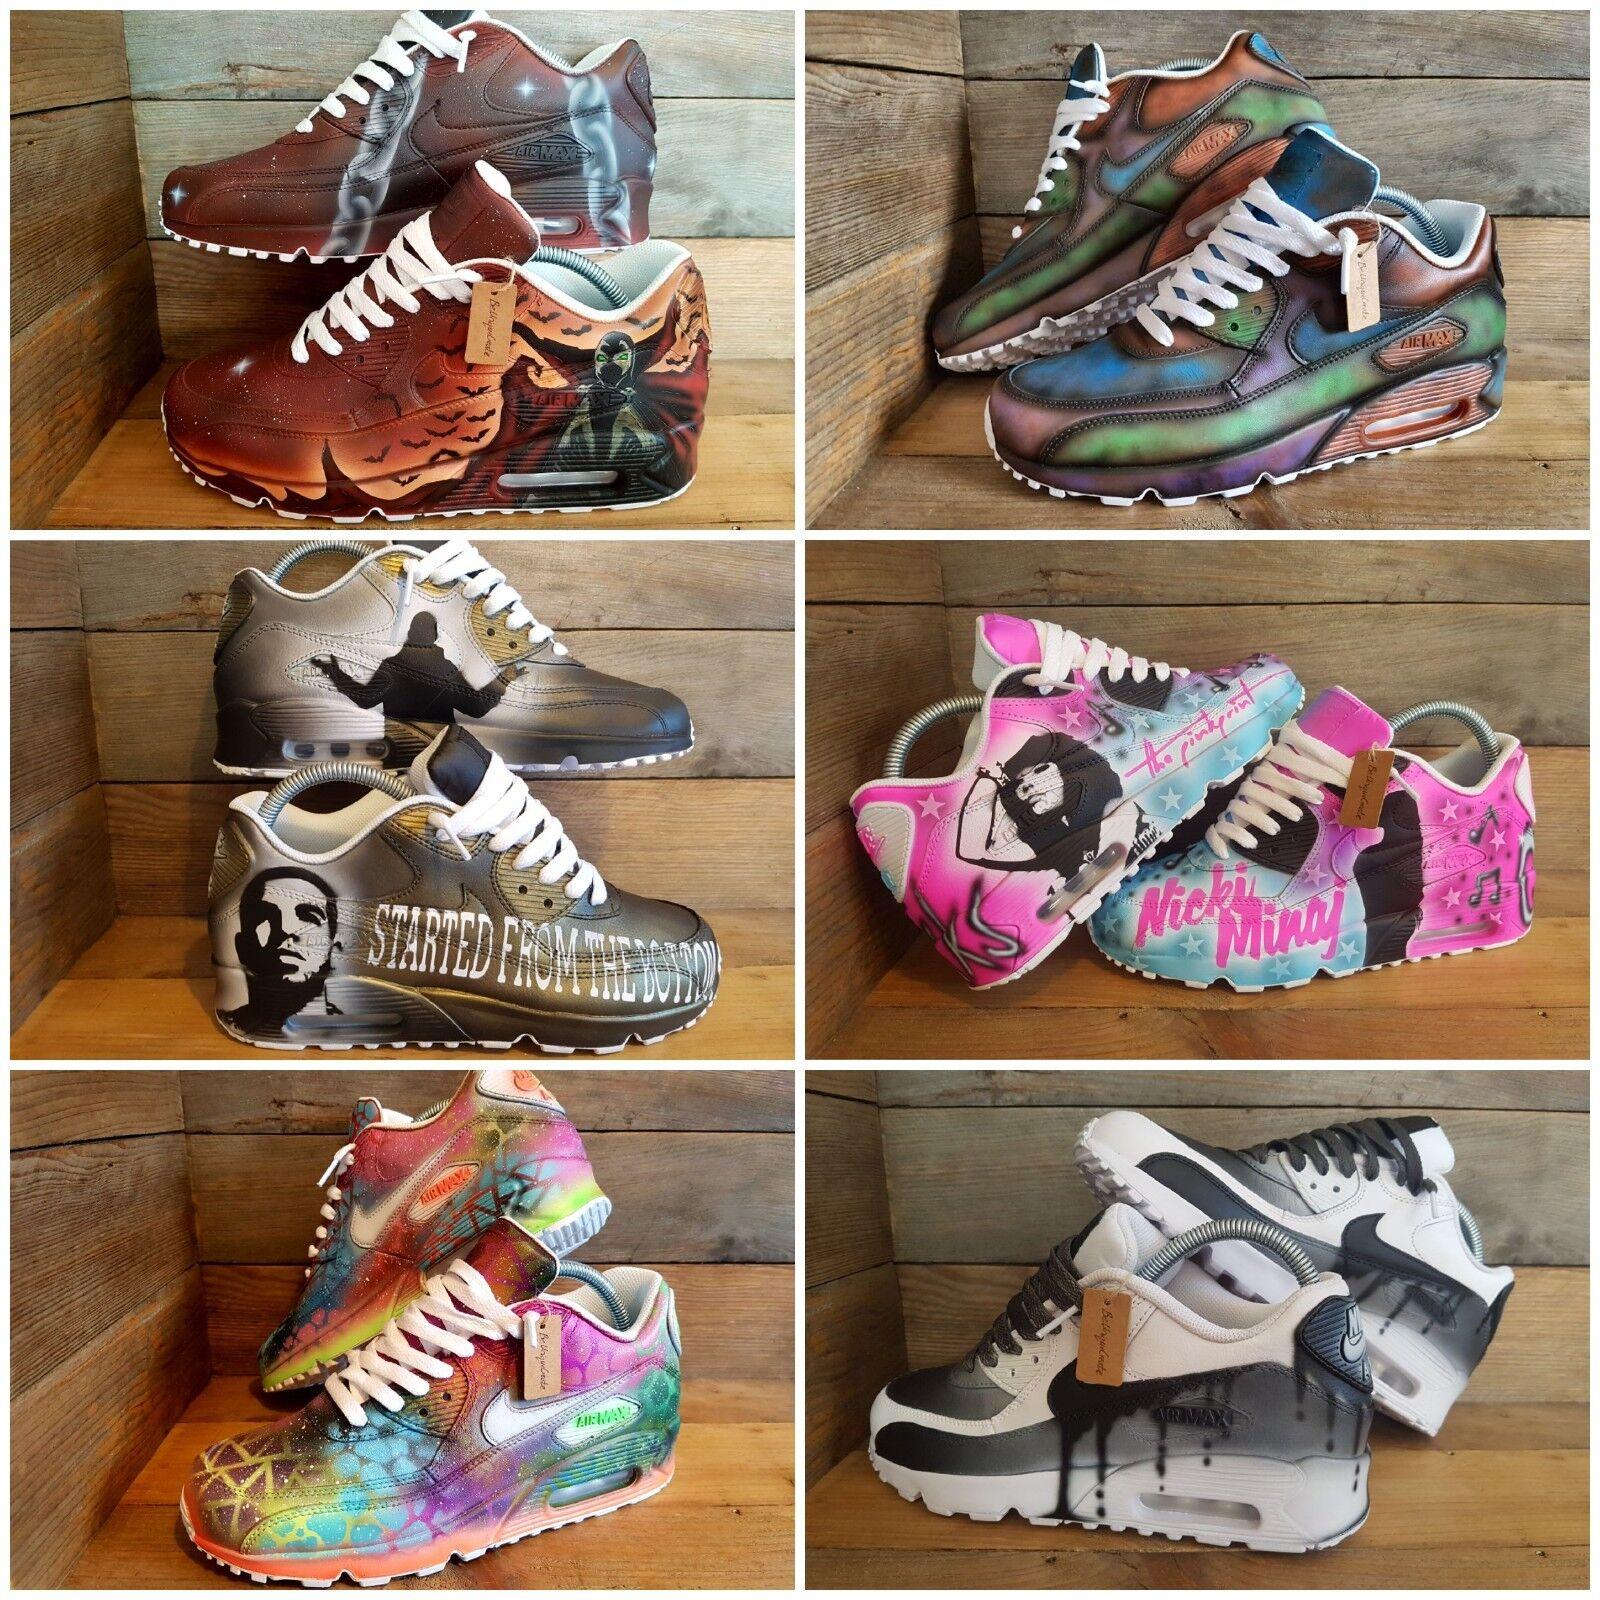 Nike AIR MAX 90/Custom 90/Custom 90/Custom dipinto/Rosa-Bianco/ultra/essenziale/ID/forza 1/Huarache | In Linea Outlet Store  | Uomo/Donne Scarpa  933718